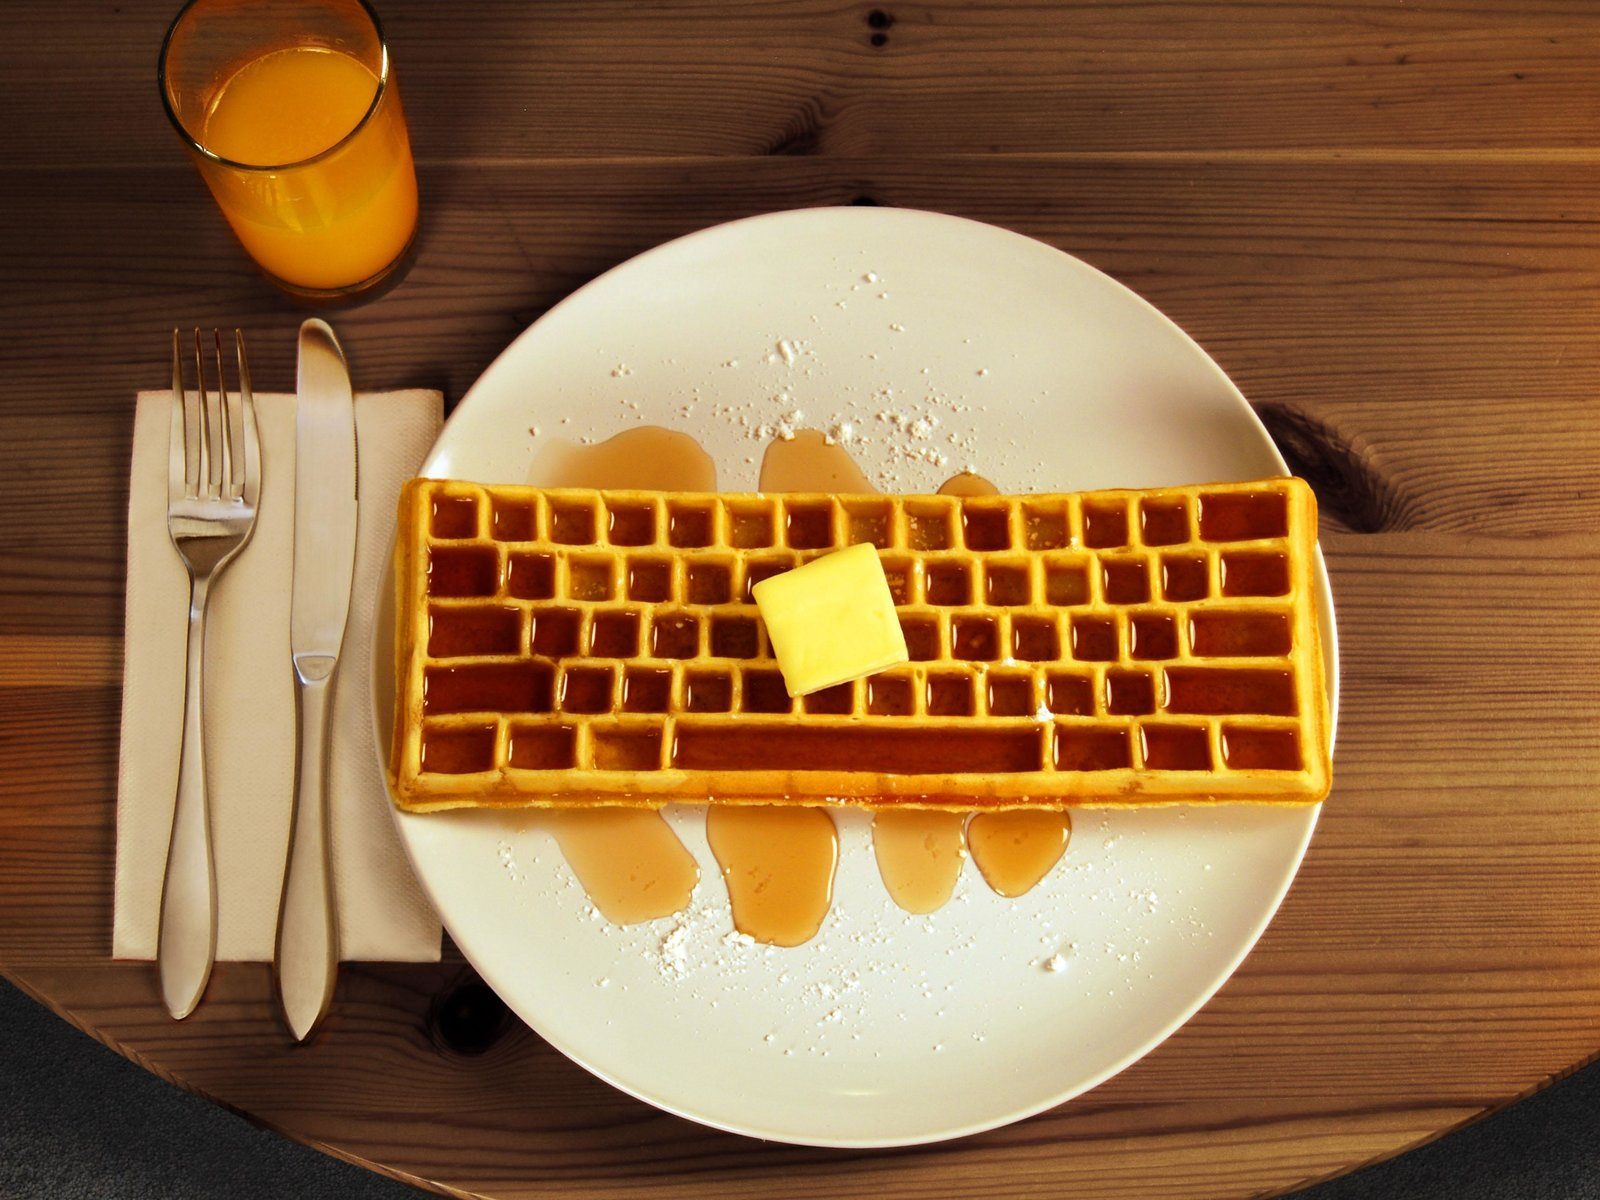 Photo 1 of 1 in The Keyboard Waffle Iron